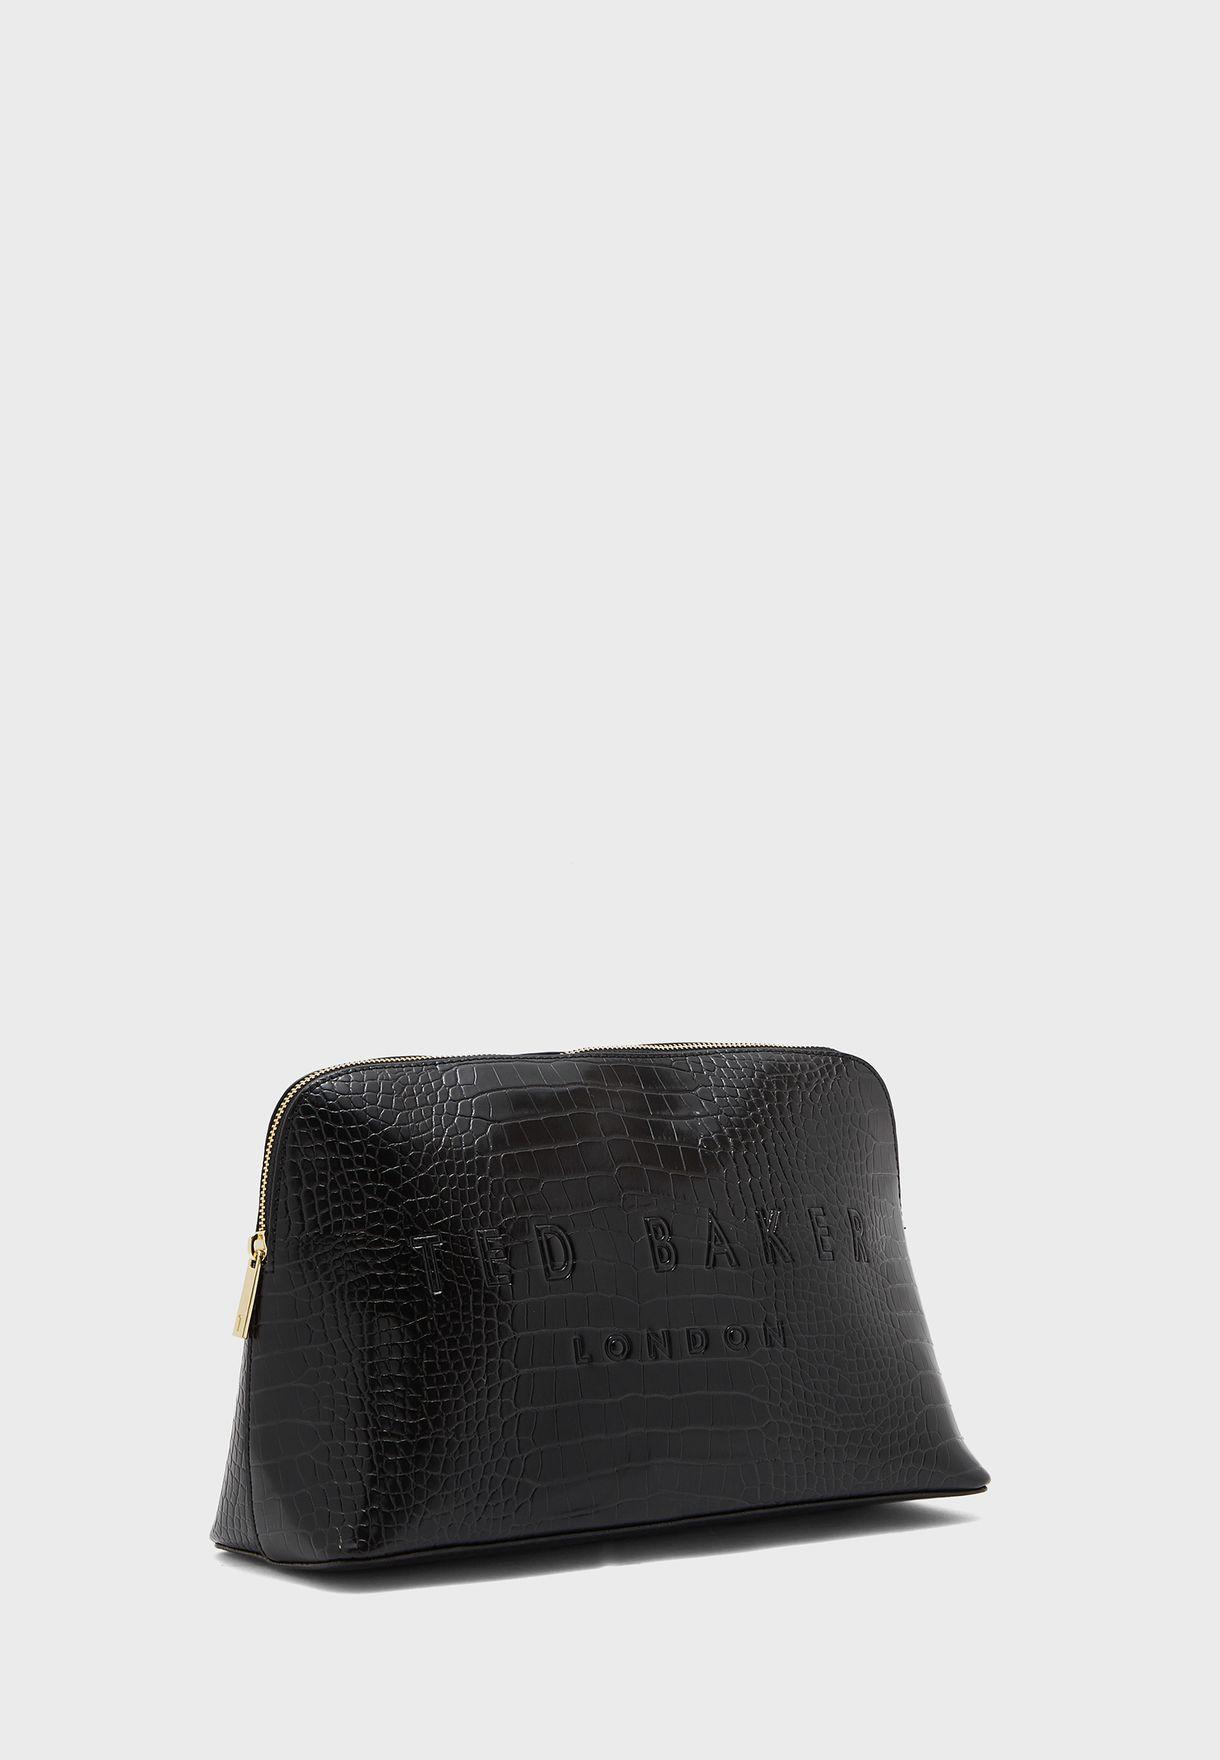 Crocana Cosmetic Bag